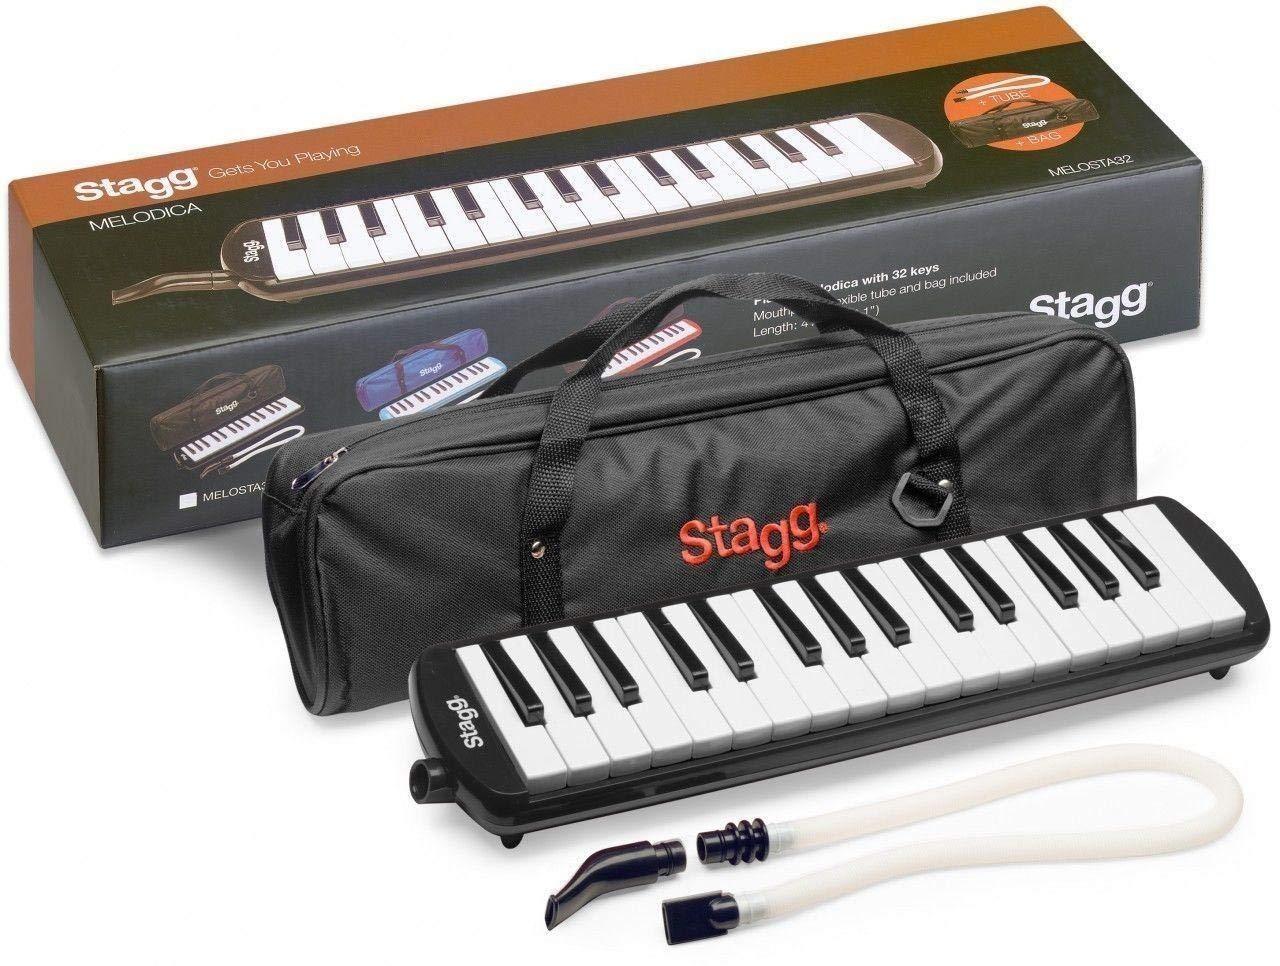 Stag Reed Keyb.32Kys.Mthp.Tb+Bag Bk by Stag